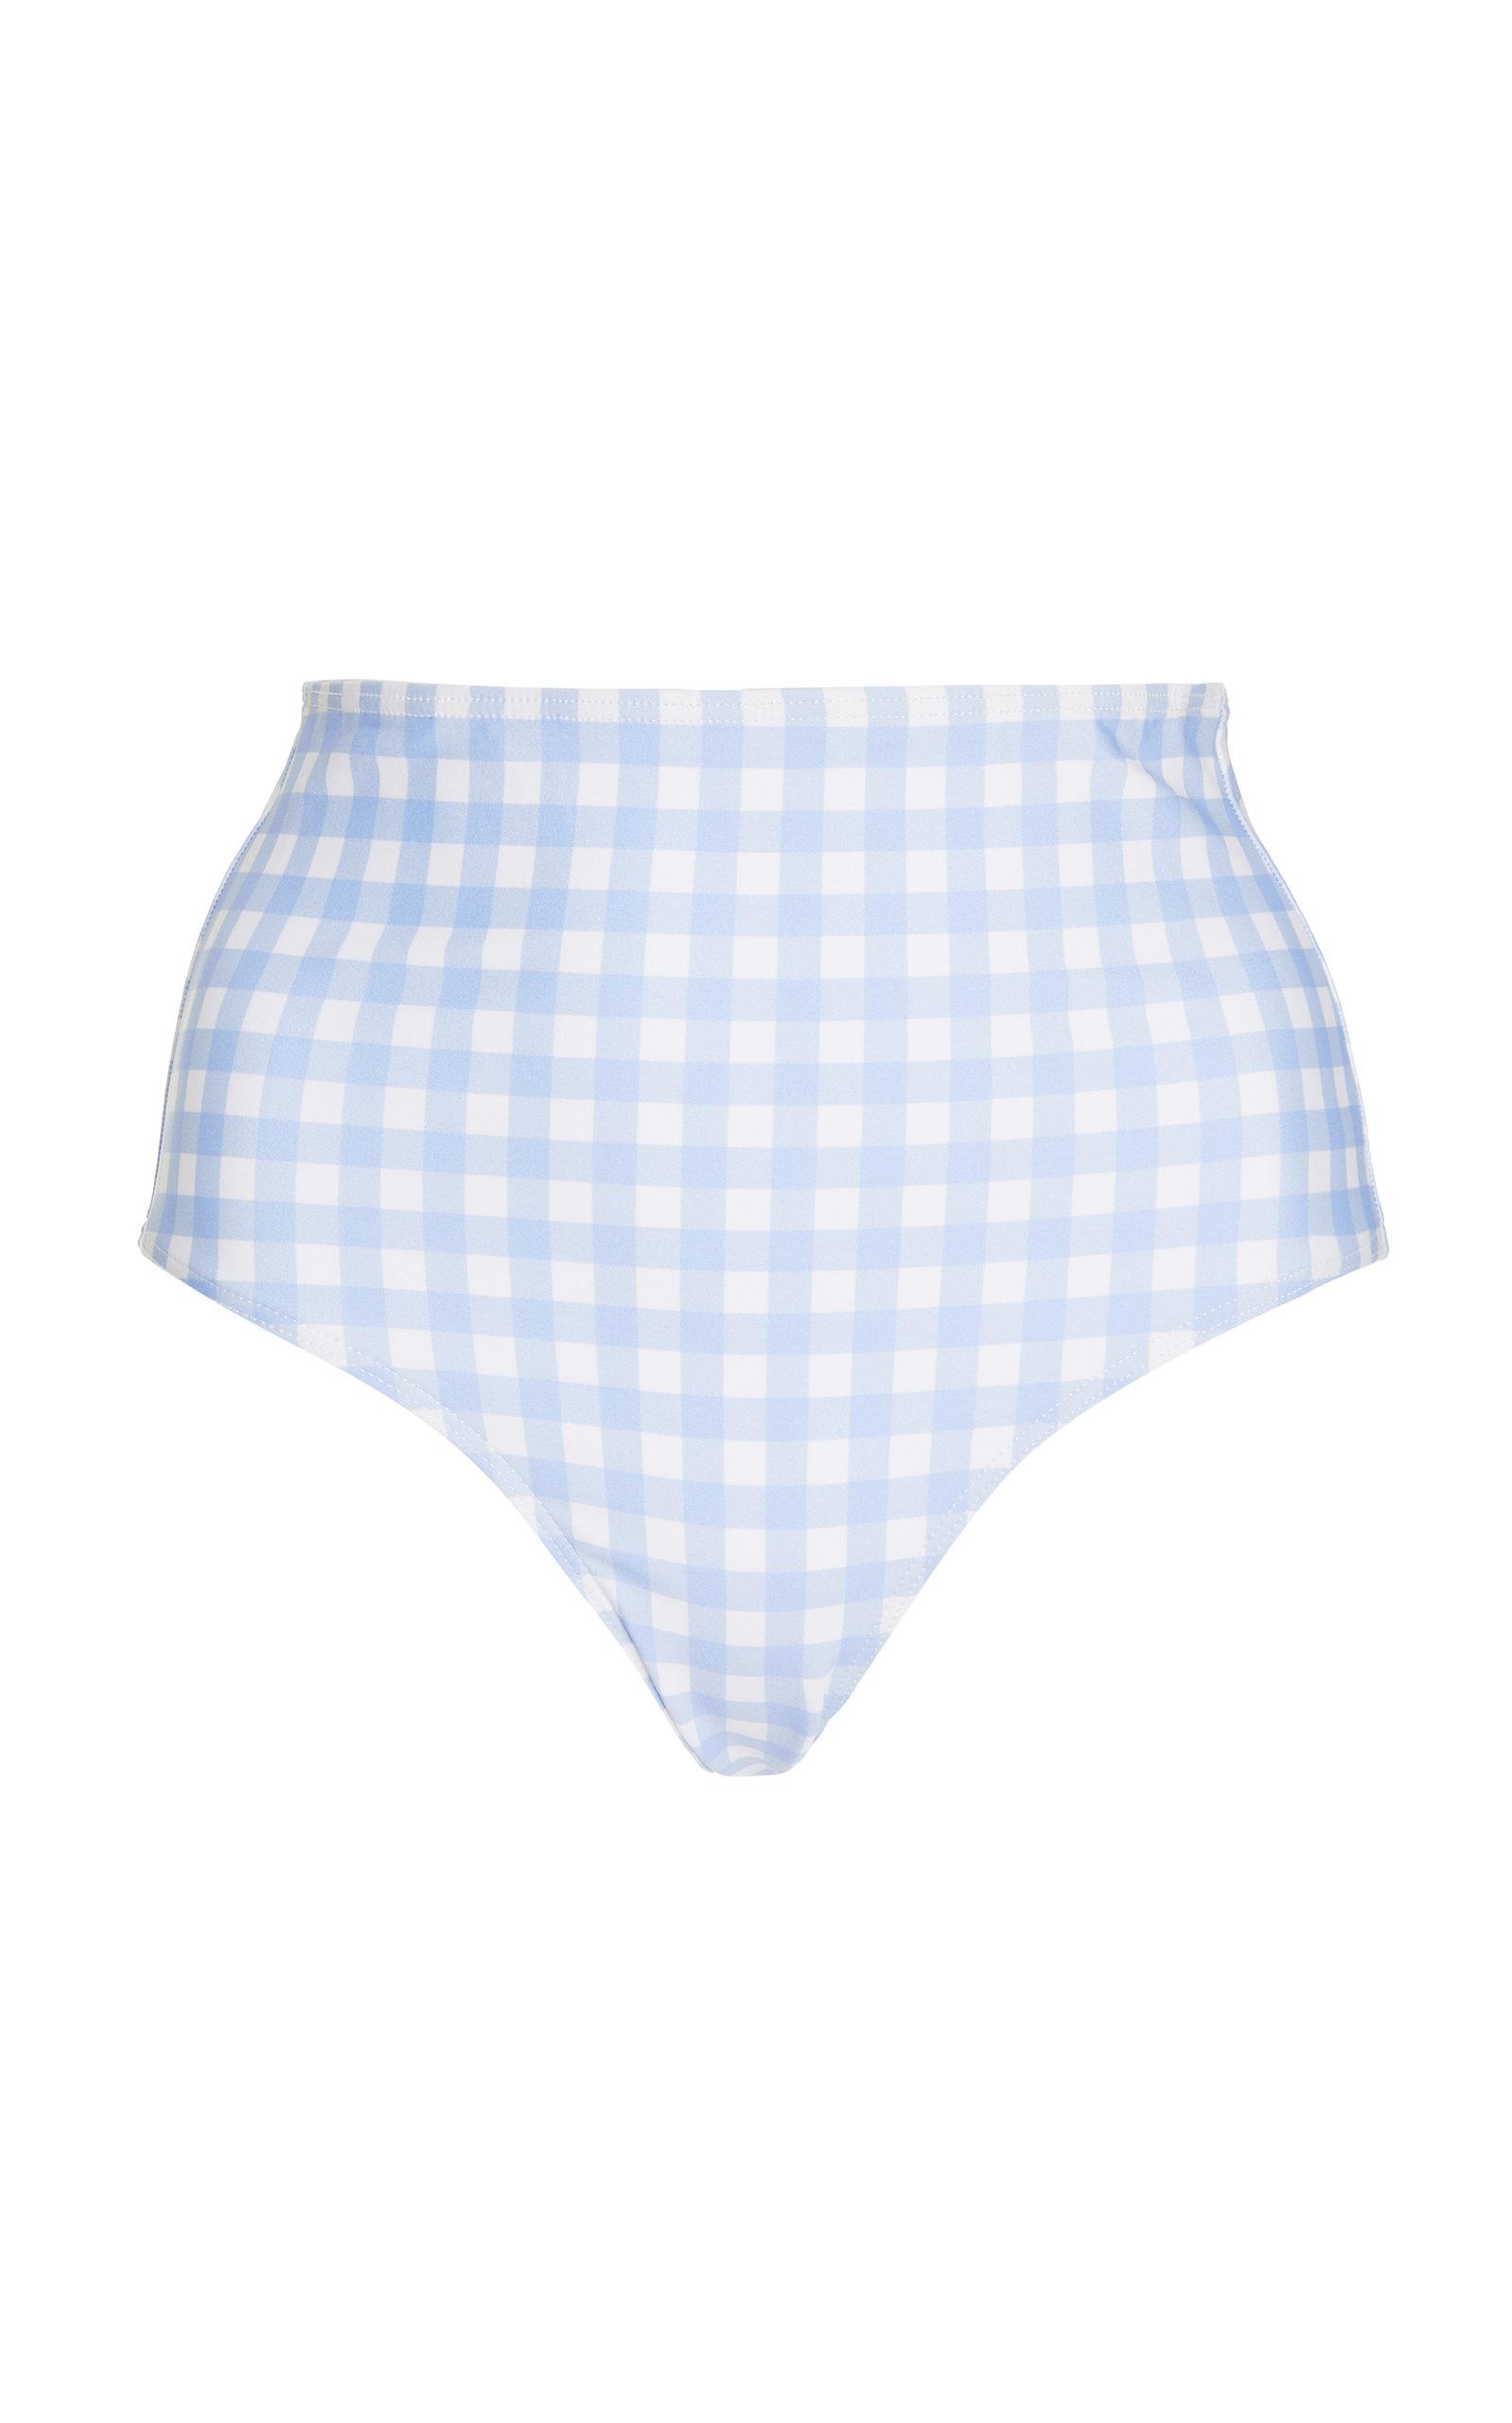 Women's Gingham High-Rise Bikini Bottoms